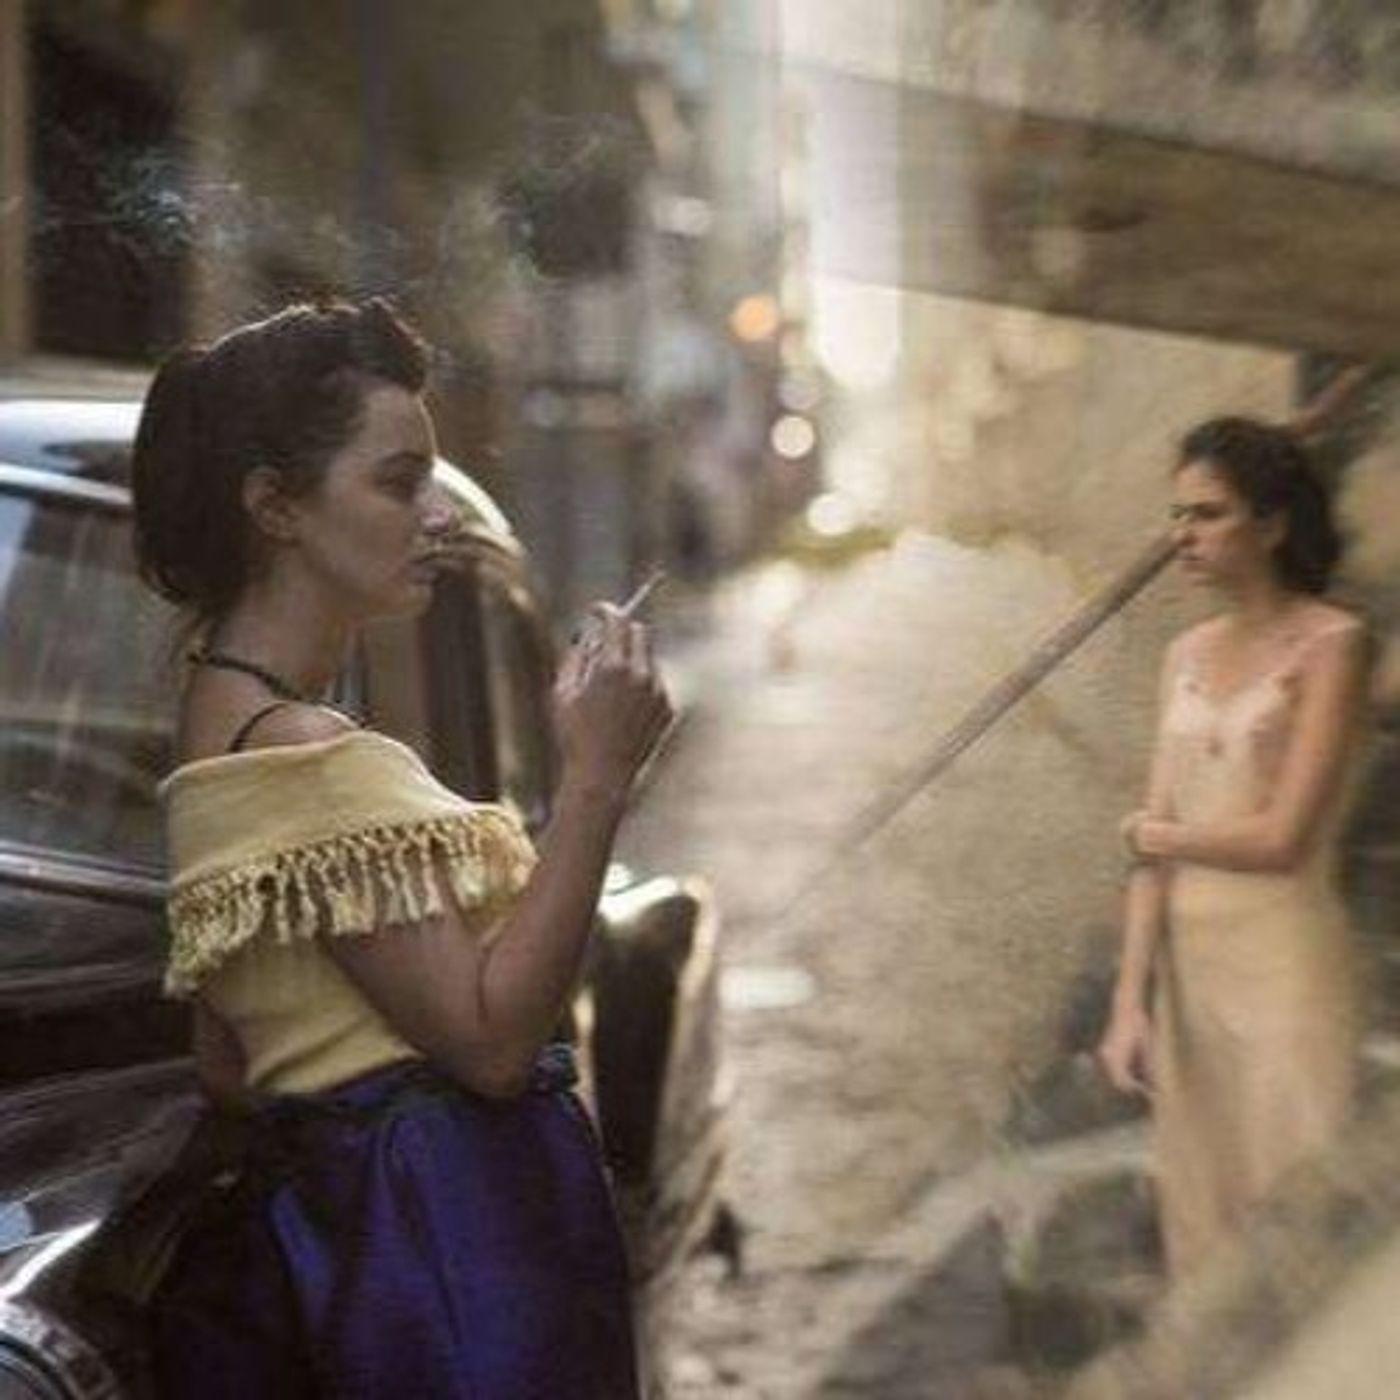 'A Vida Invisível' e 'Downton Abbey - O filme' nas telonas